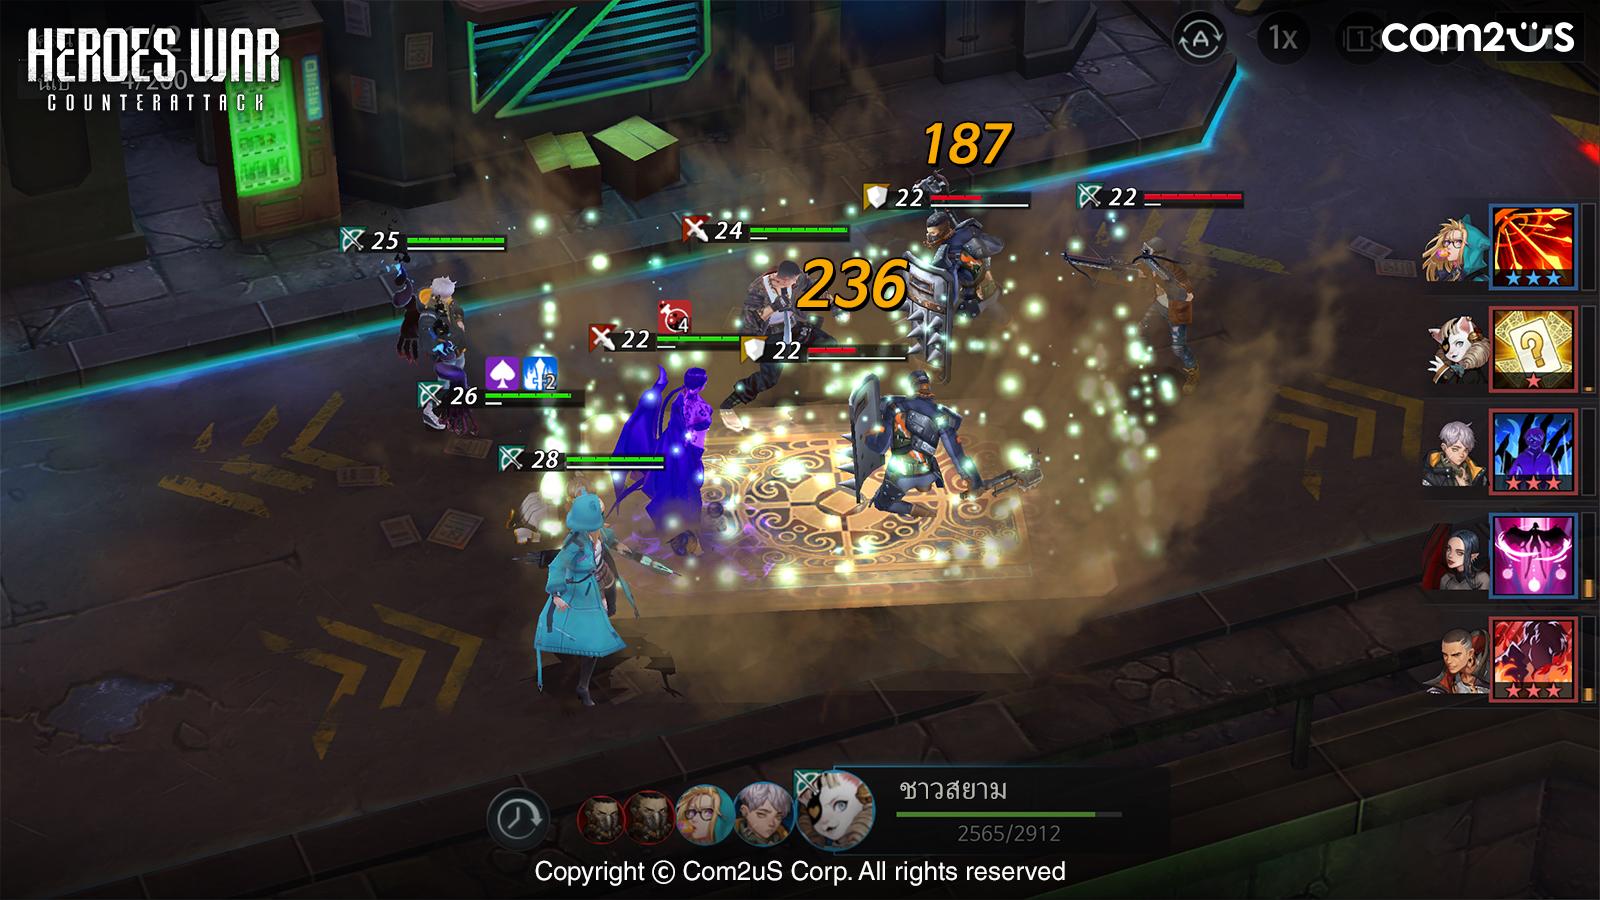 Heroes War Counterattack 1420202 3